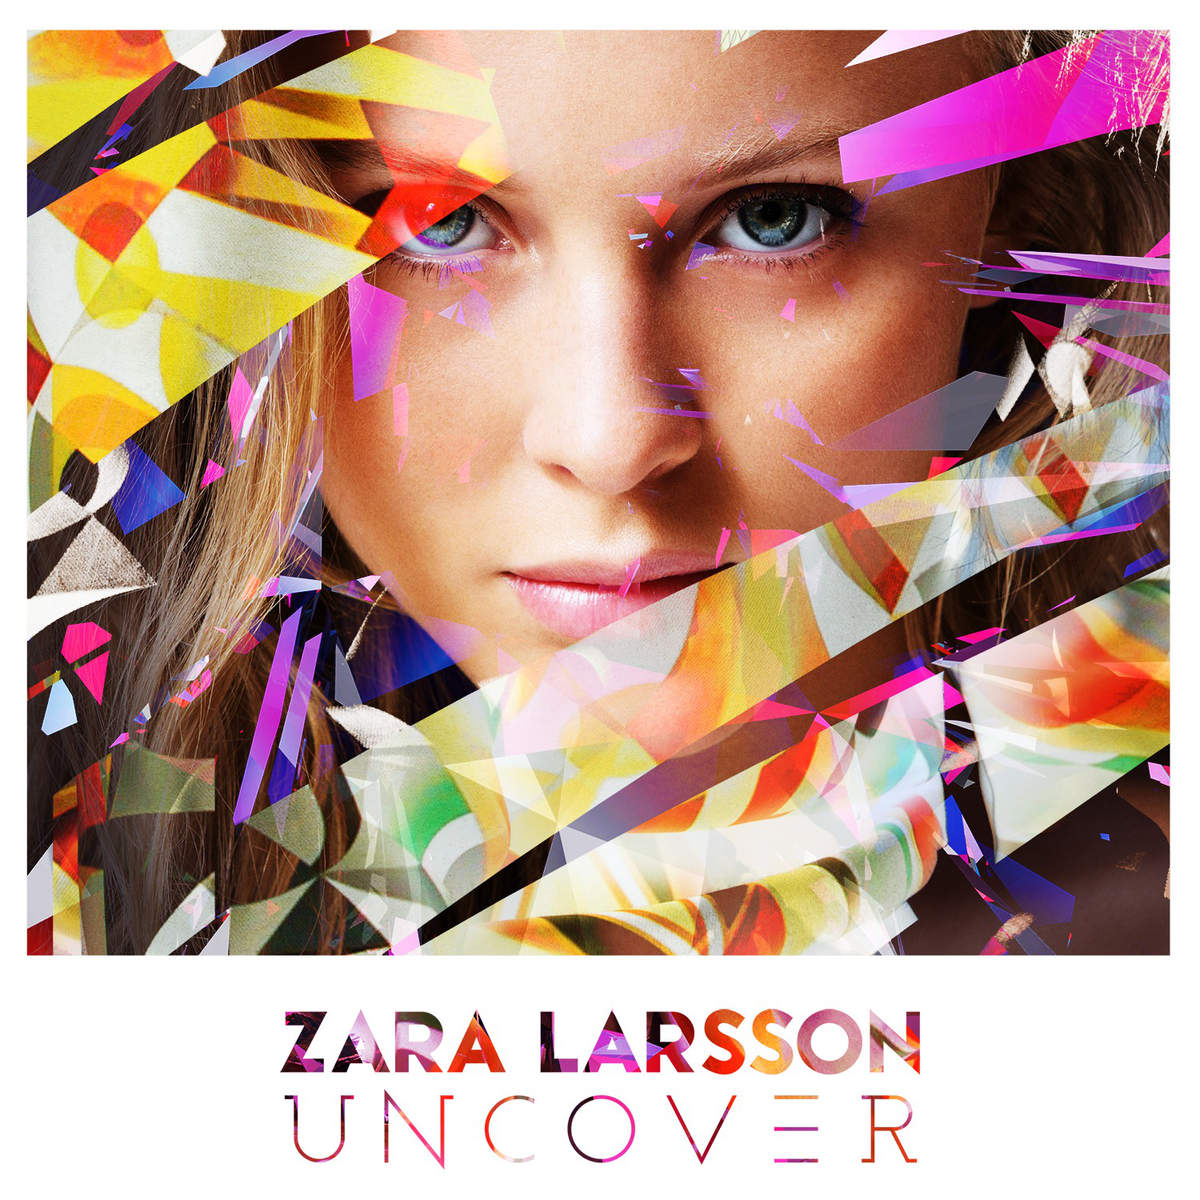 c717e70fb2 ultratop.be - Zara Larsson - Uncover